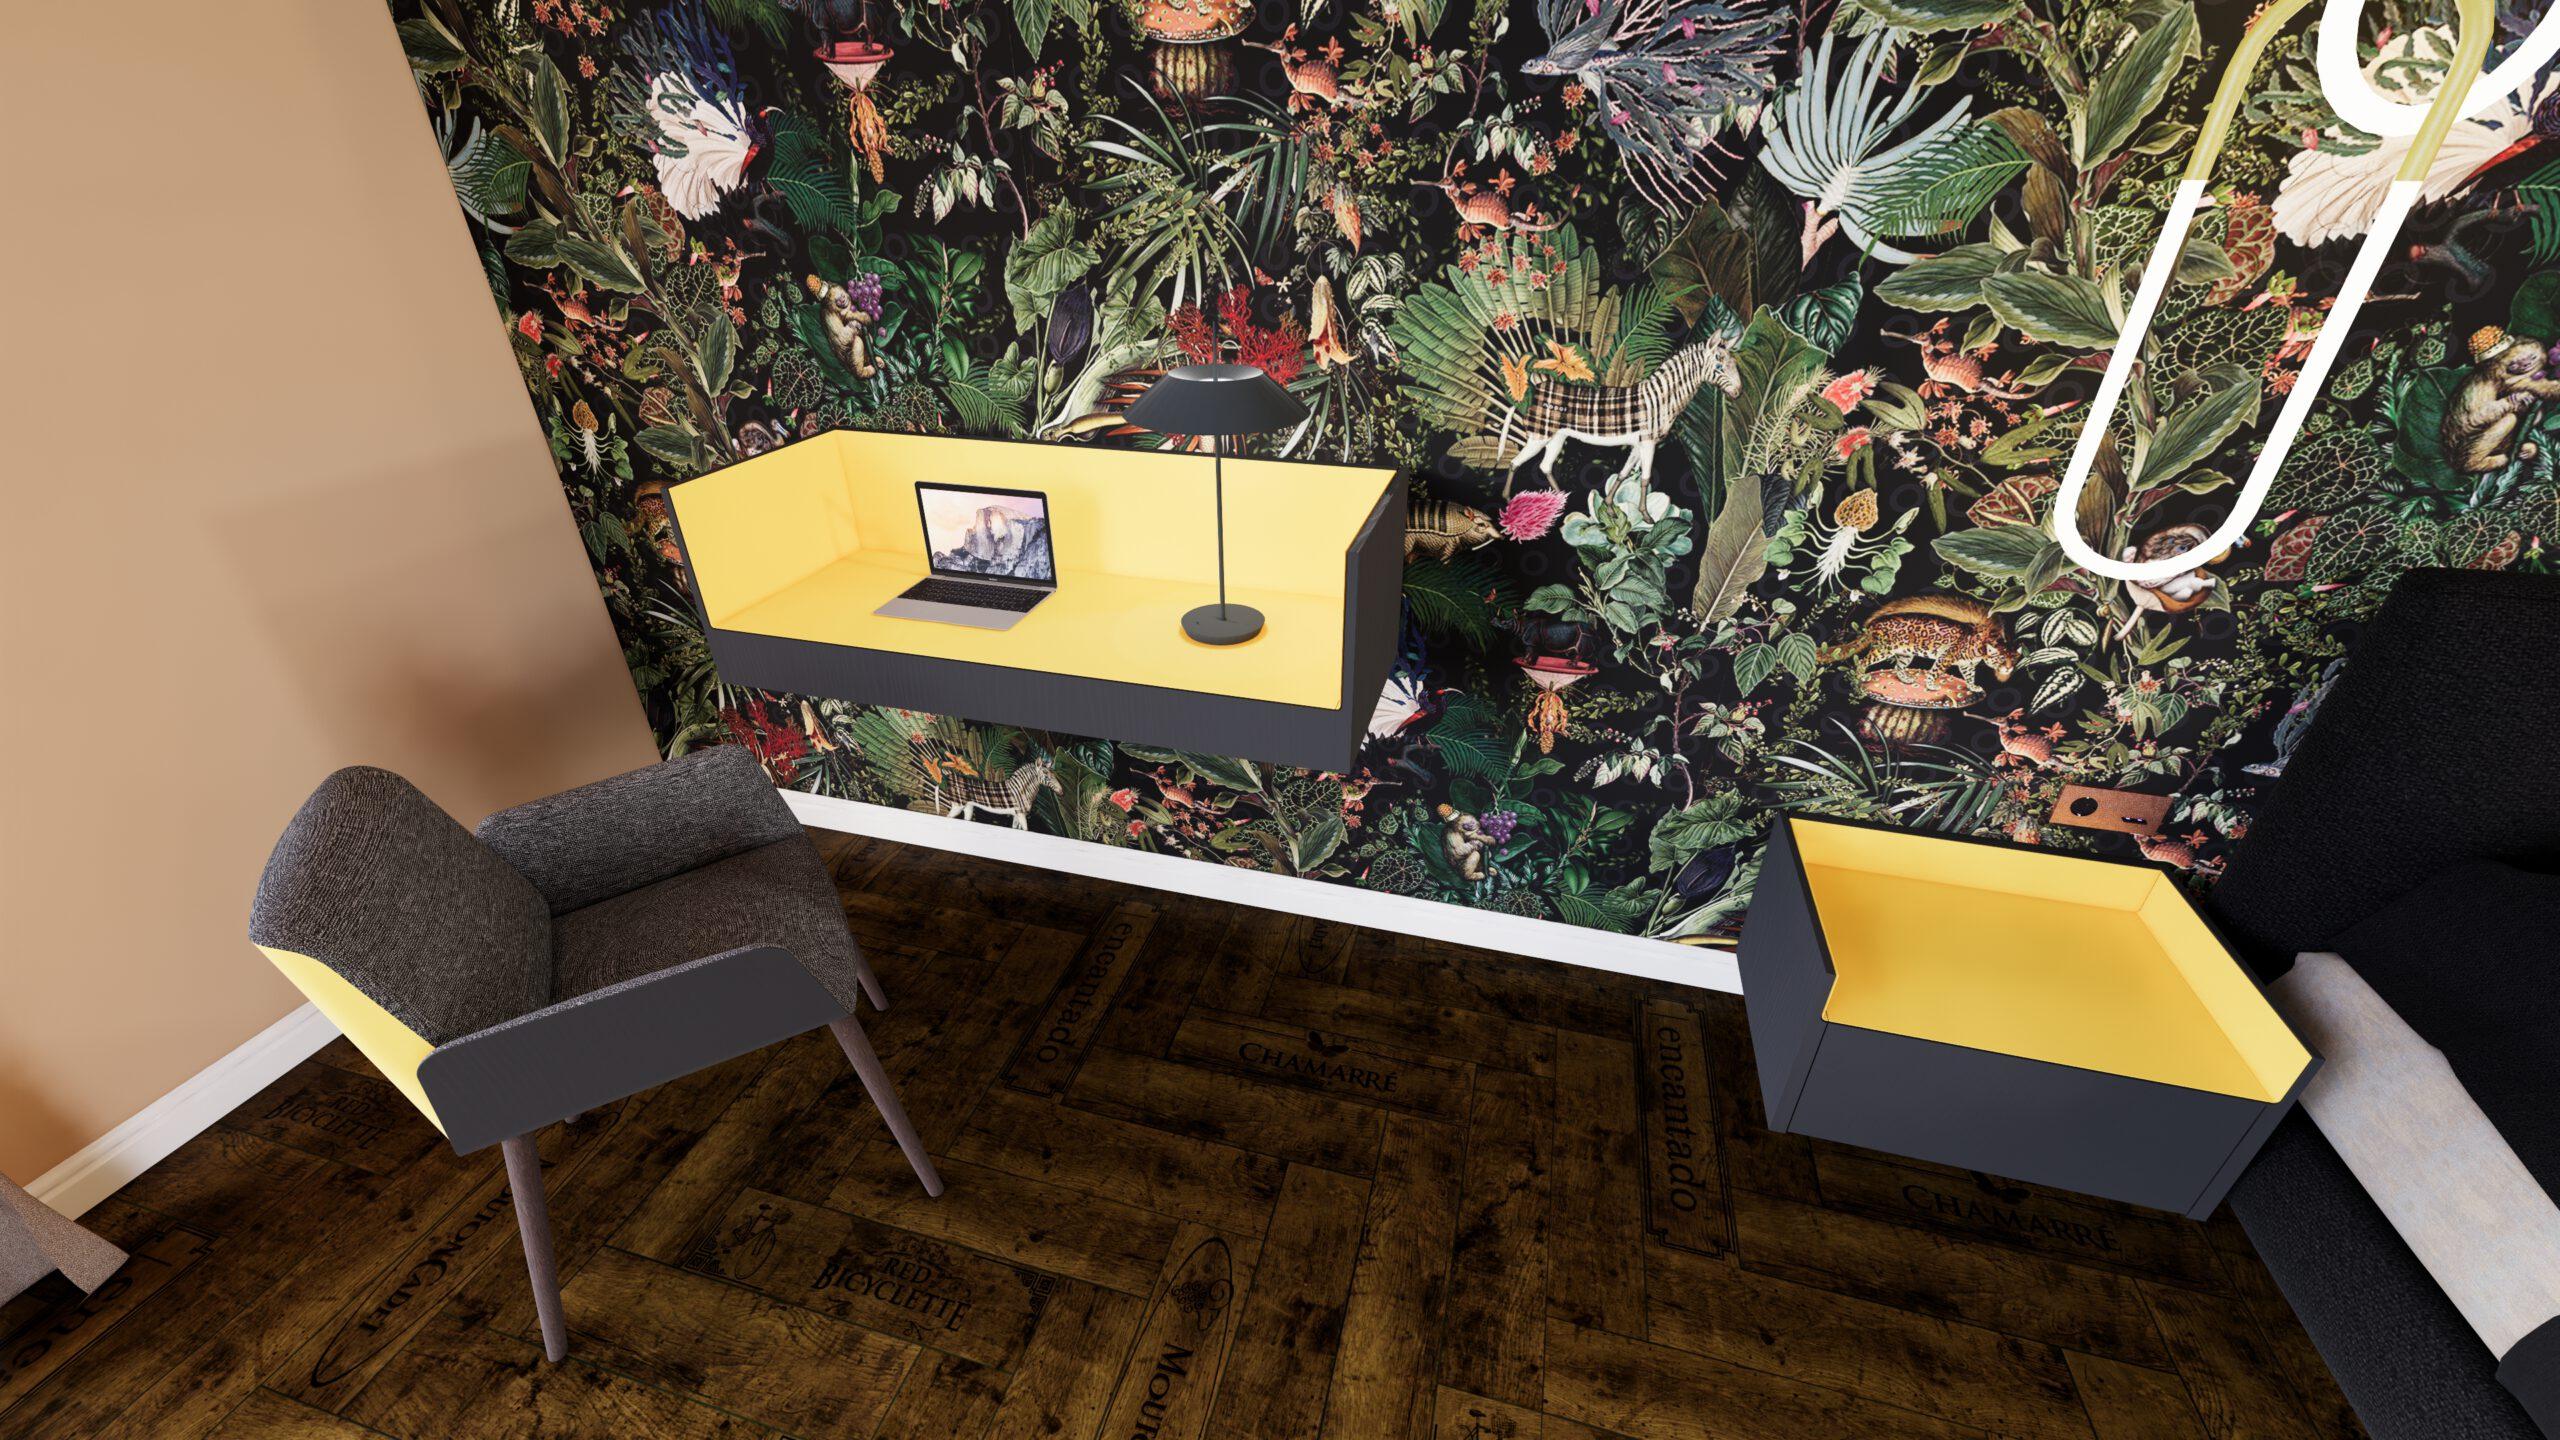 Hotelzimmer Hotel Bett Stuhl Schreibtisch Vibia Roll&Hill Basalte Tapete Arte Tepich Parkettboden Sessel Beleuchtung Vibia